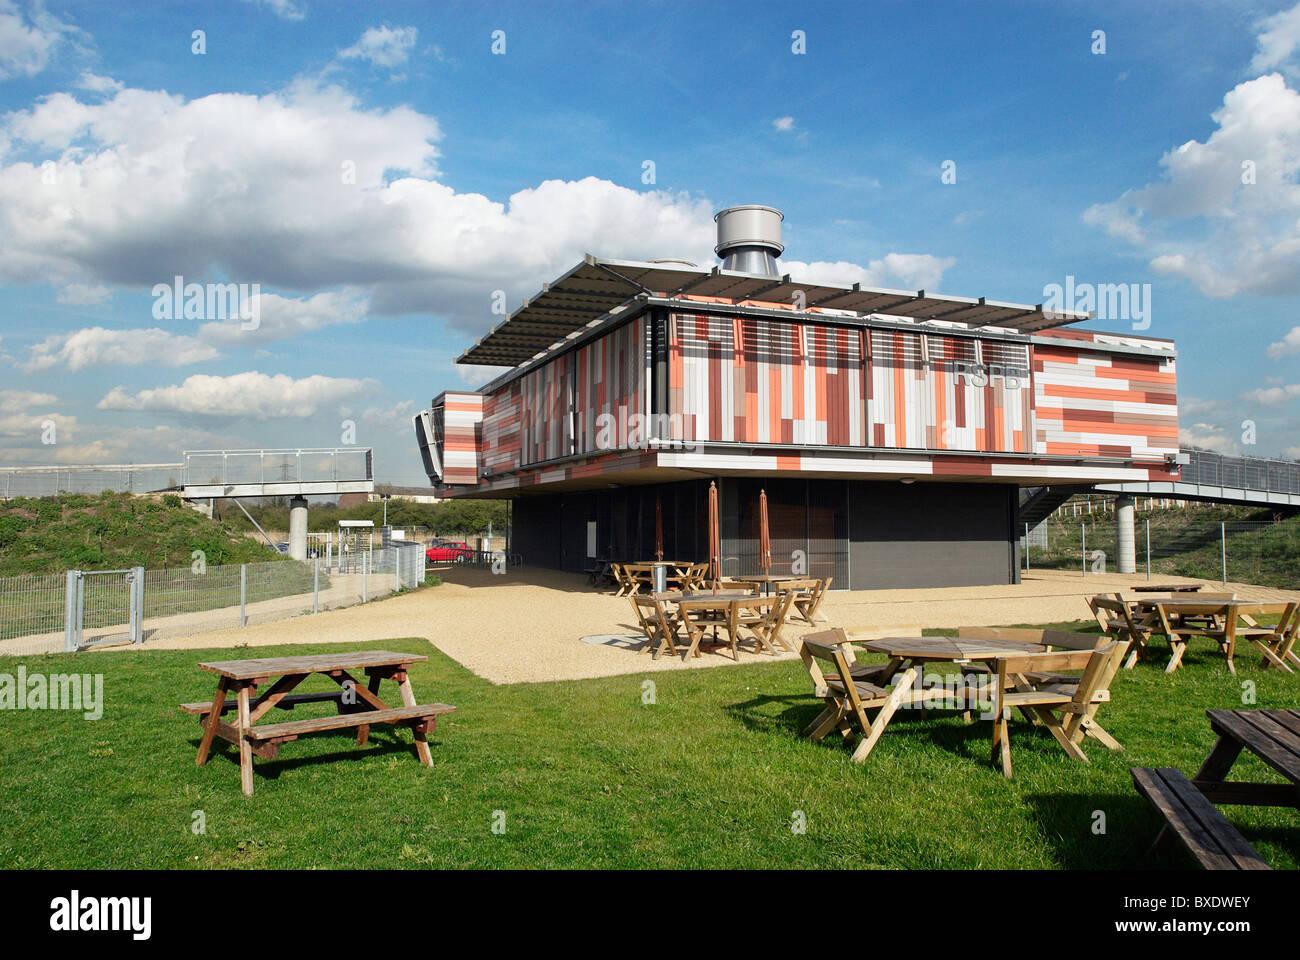 Eco-friendly architecture at RSPB centre Rainham Marshes Essex UK - Stock Image